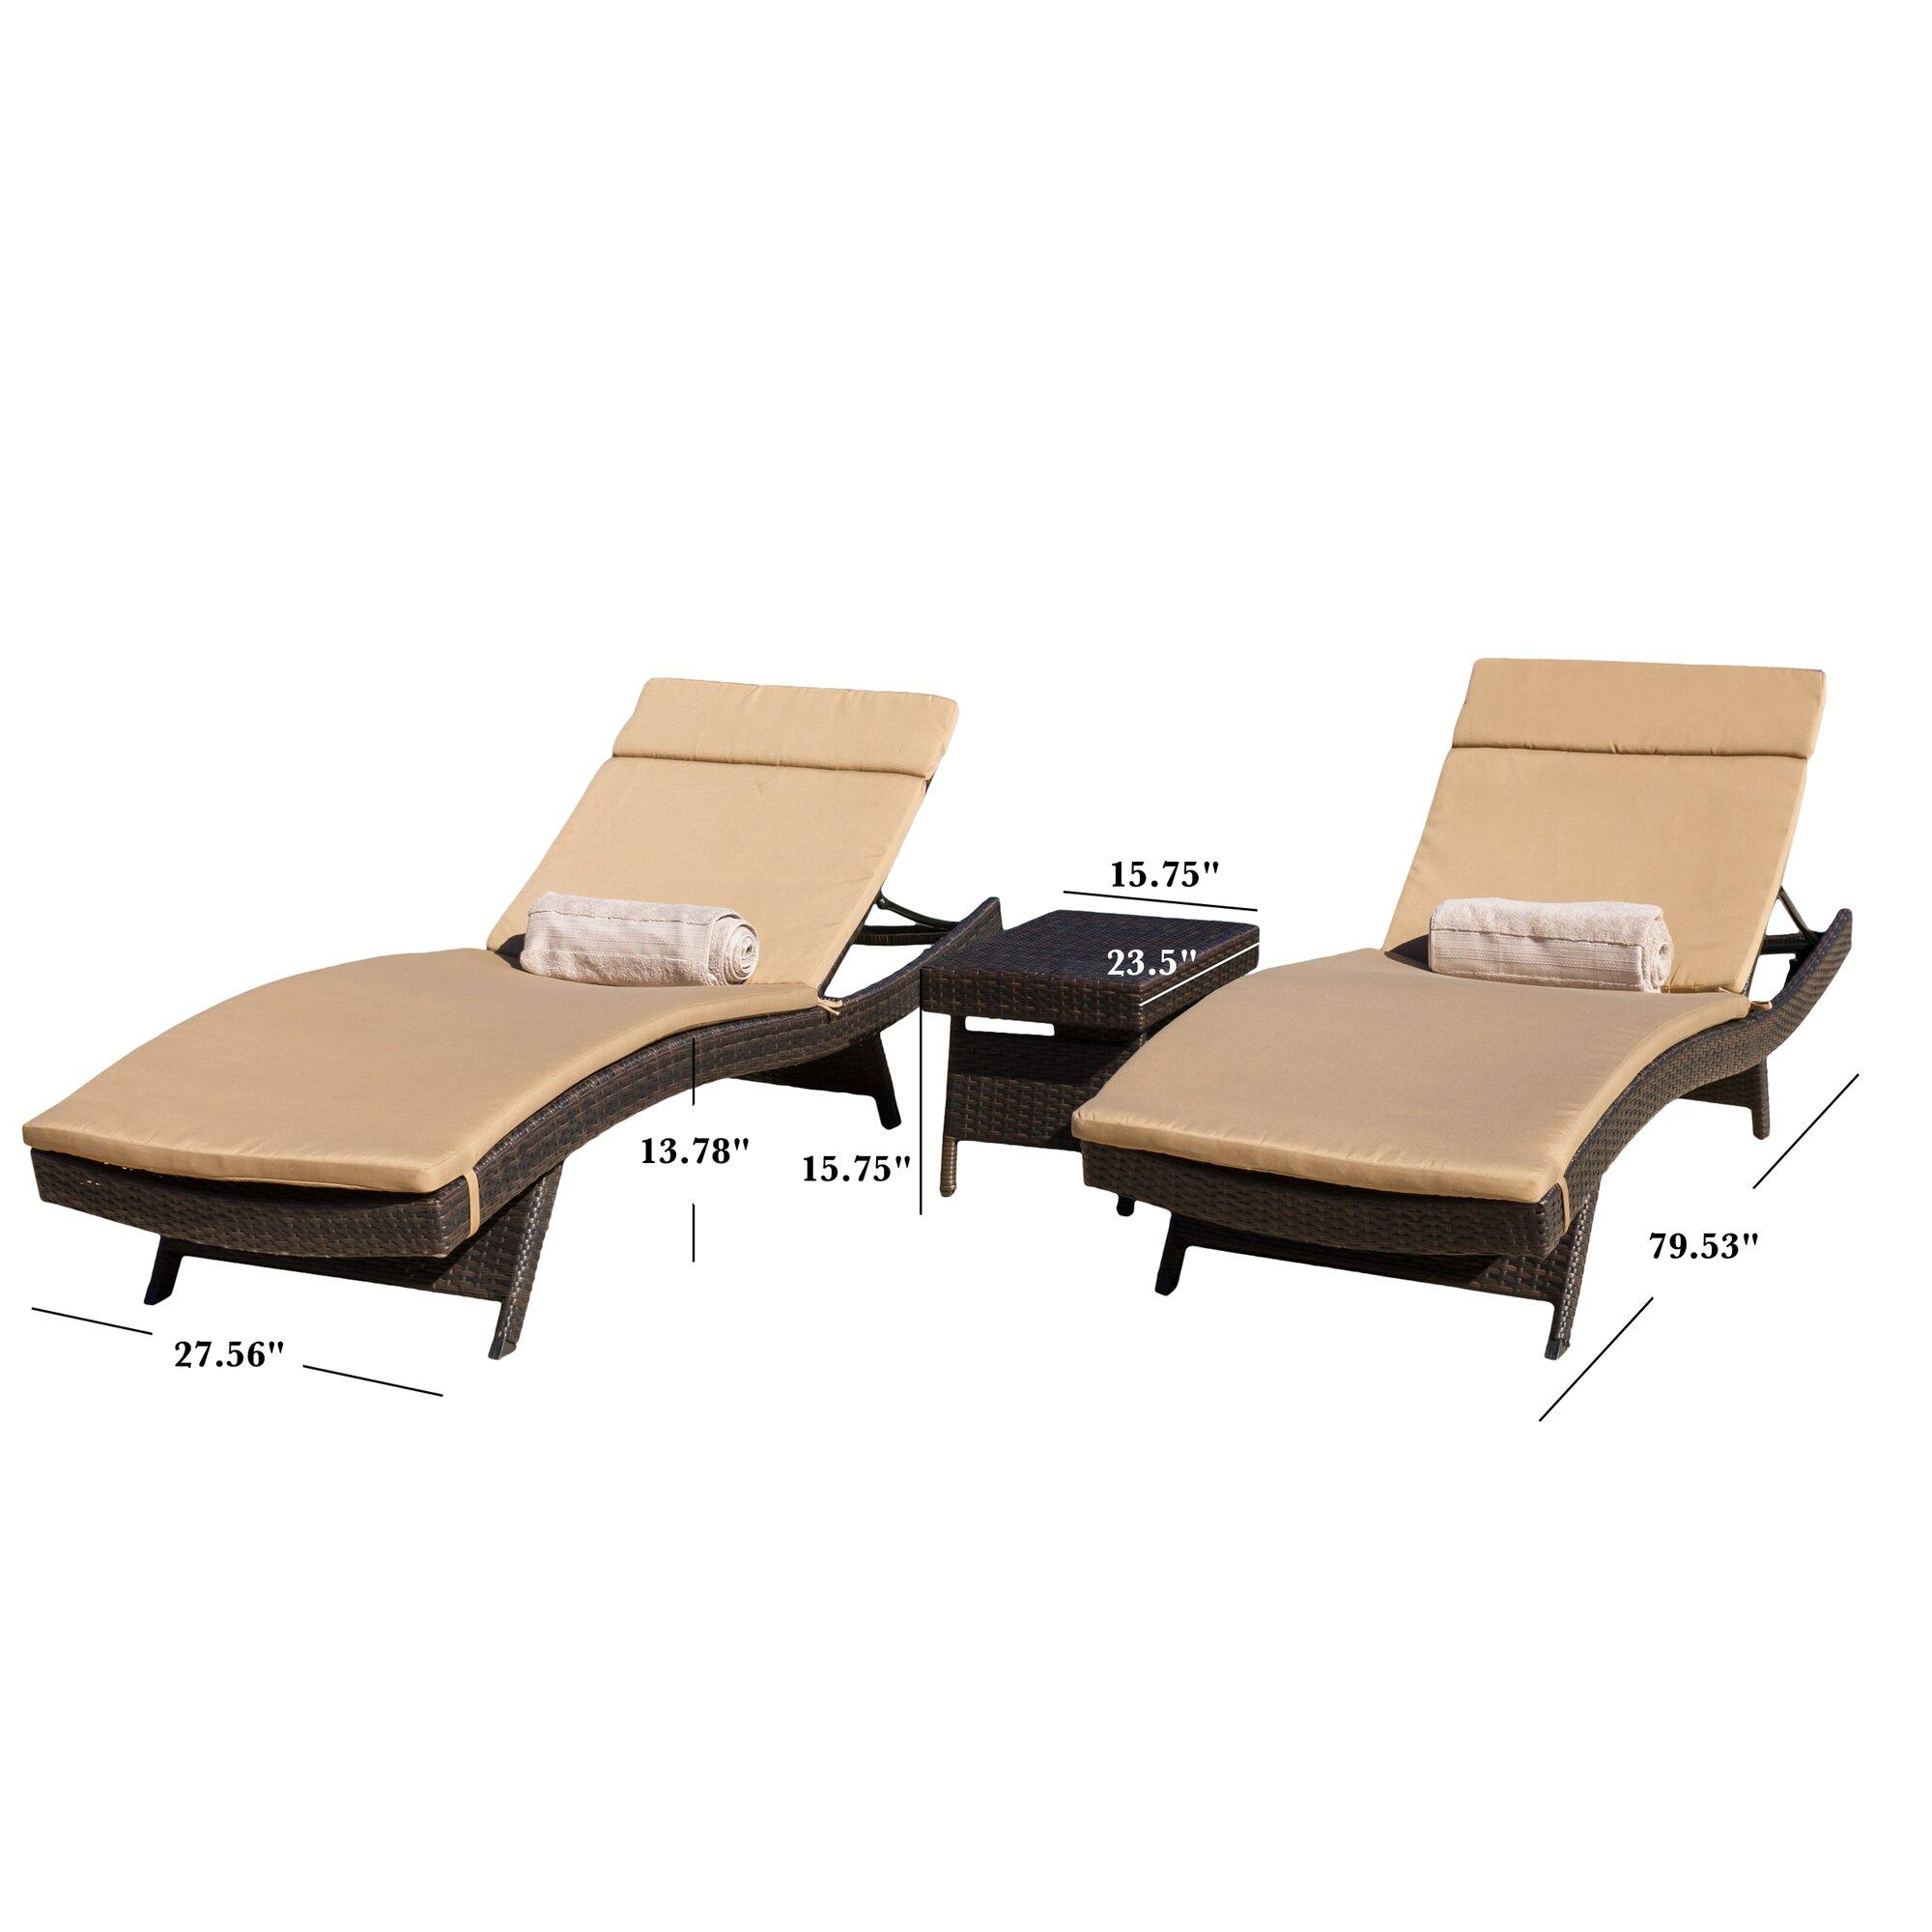 Home Loft Concepts Rio Vista Chaise Lounge Set with Cushion & Reviews